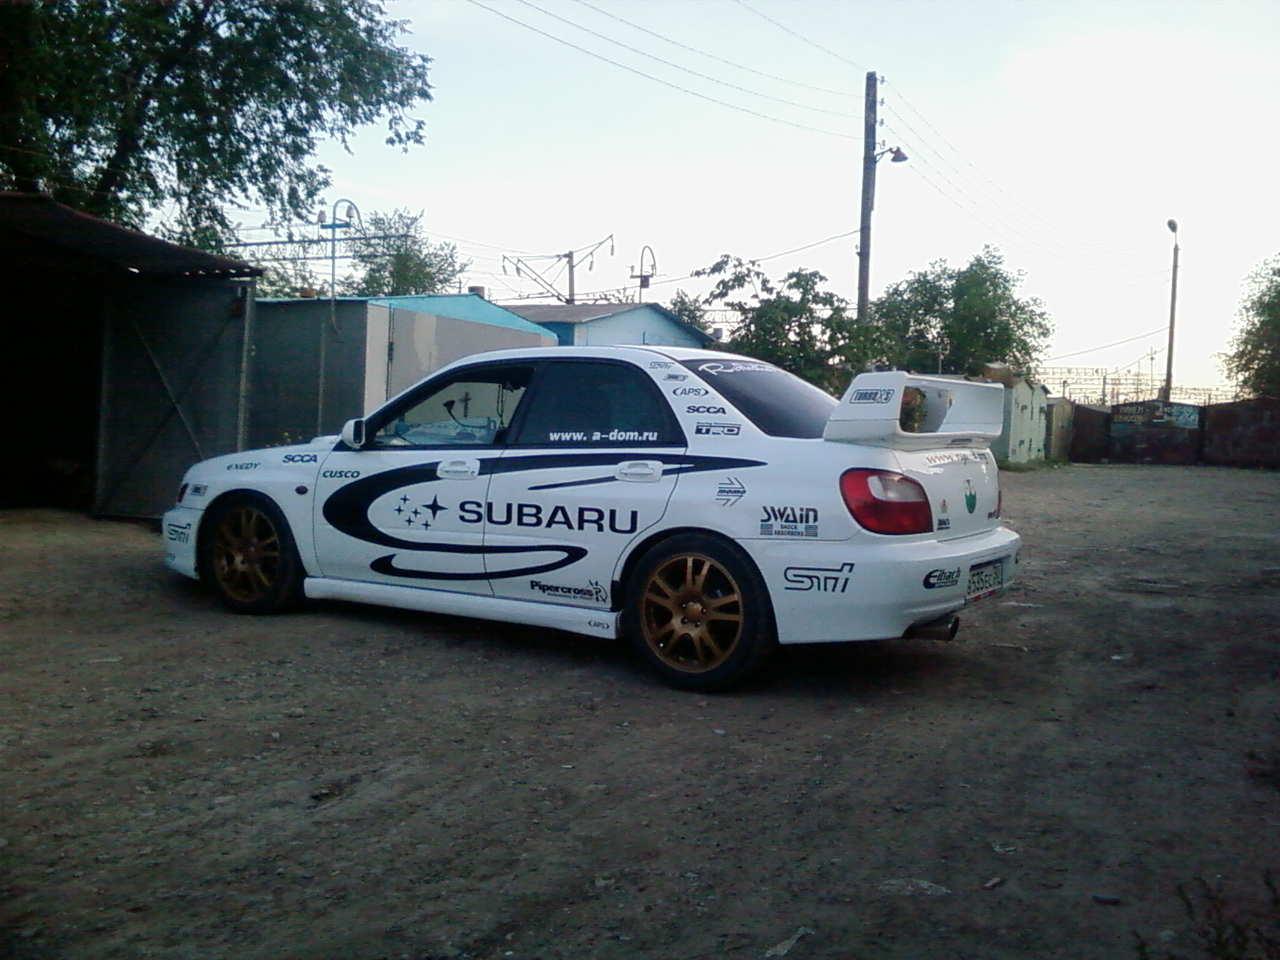 2000 Subaru Impreza Wrx Sti Wallpapers 2 0l Gasoline